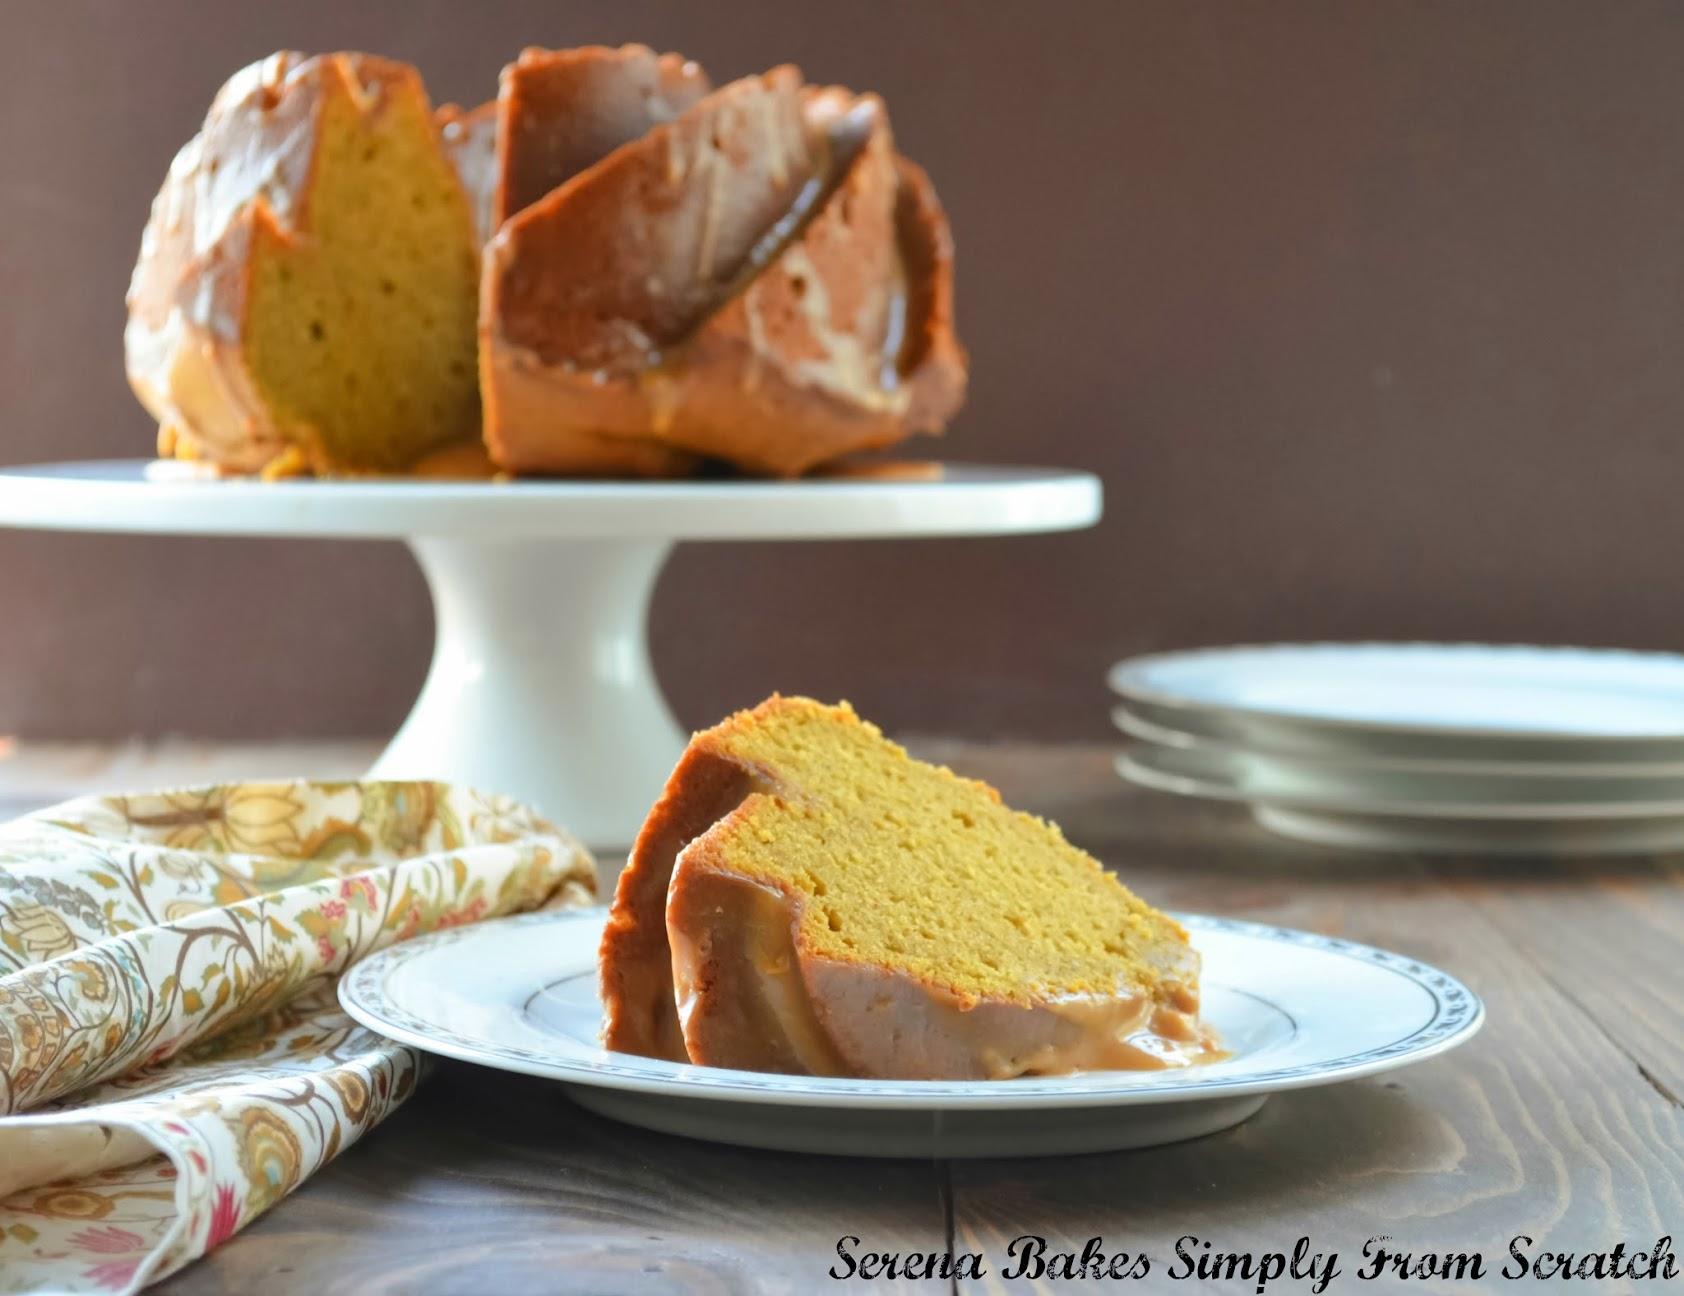 Pumpkin-Spice-Bundt-Cake-With-Caramel-Icing.jpg